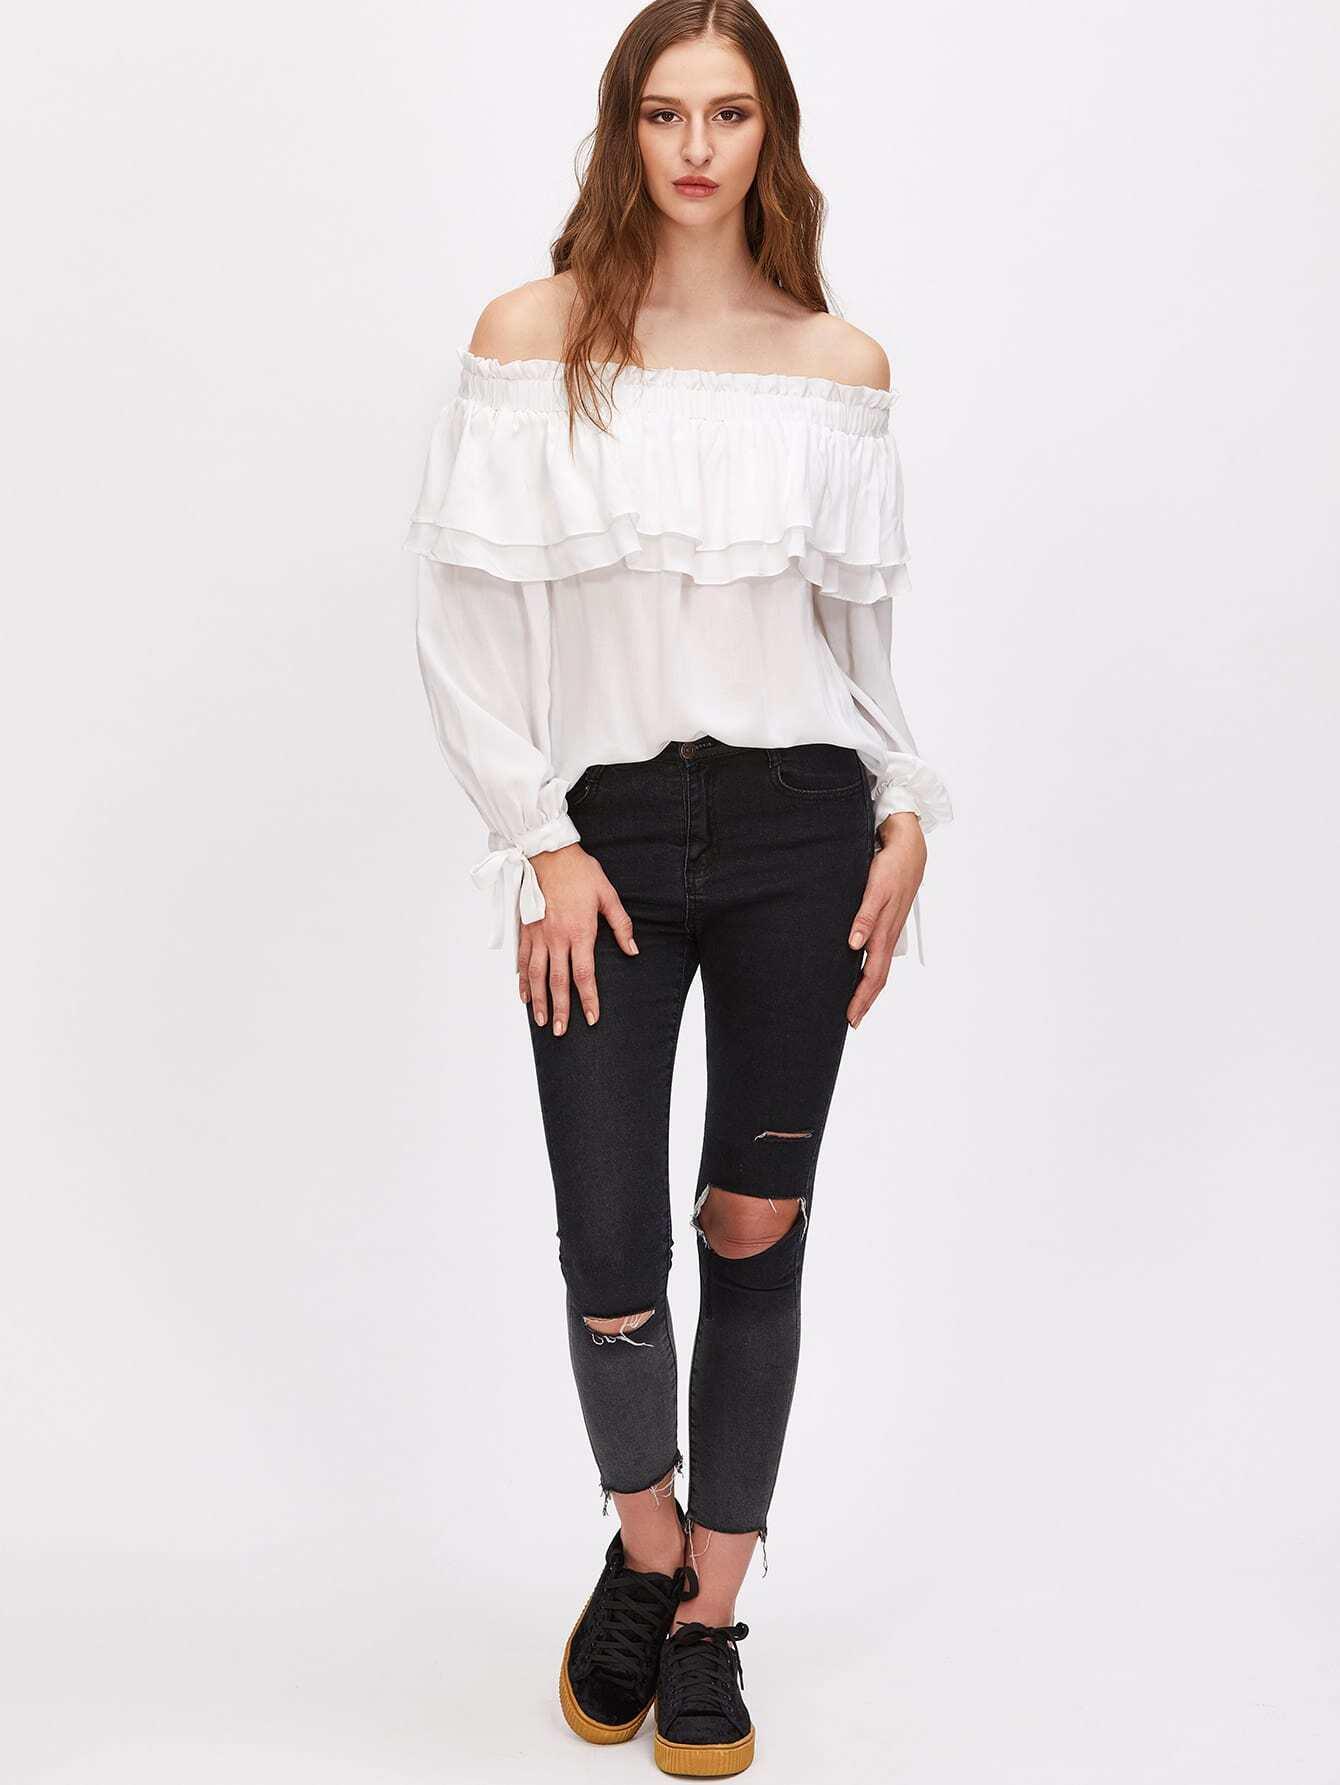 blouse161222702_2